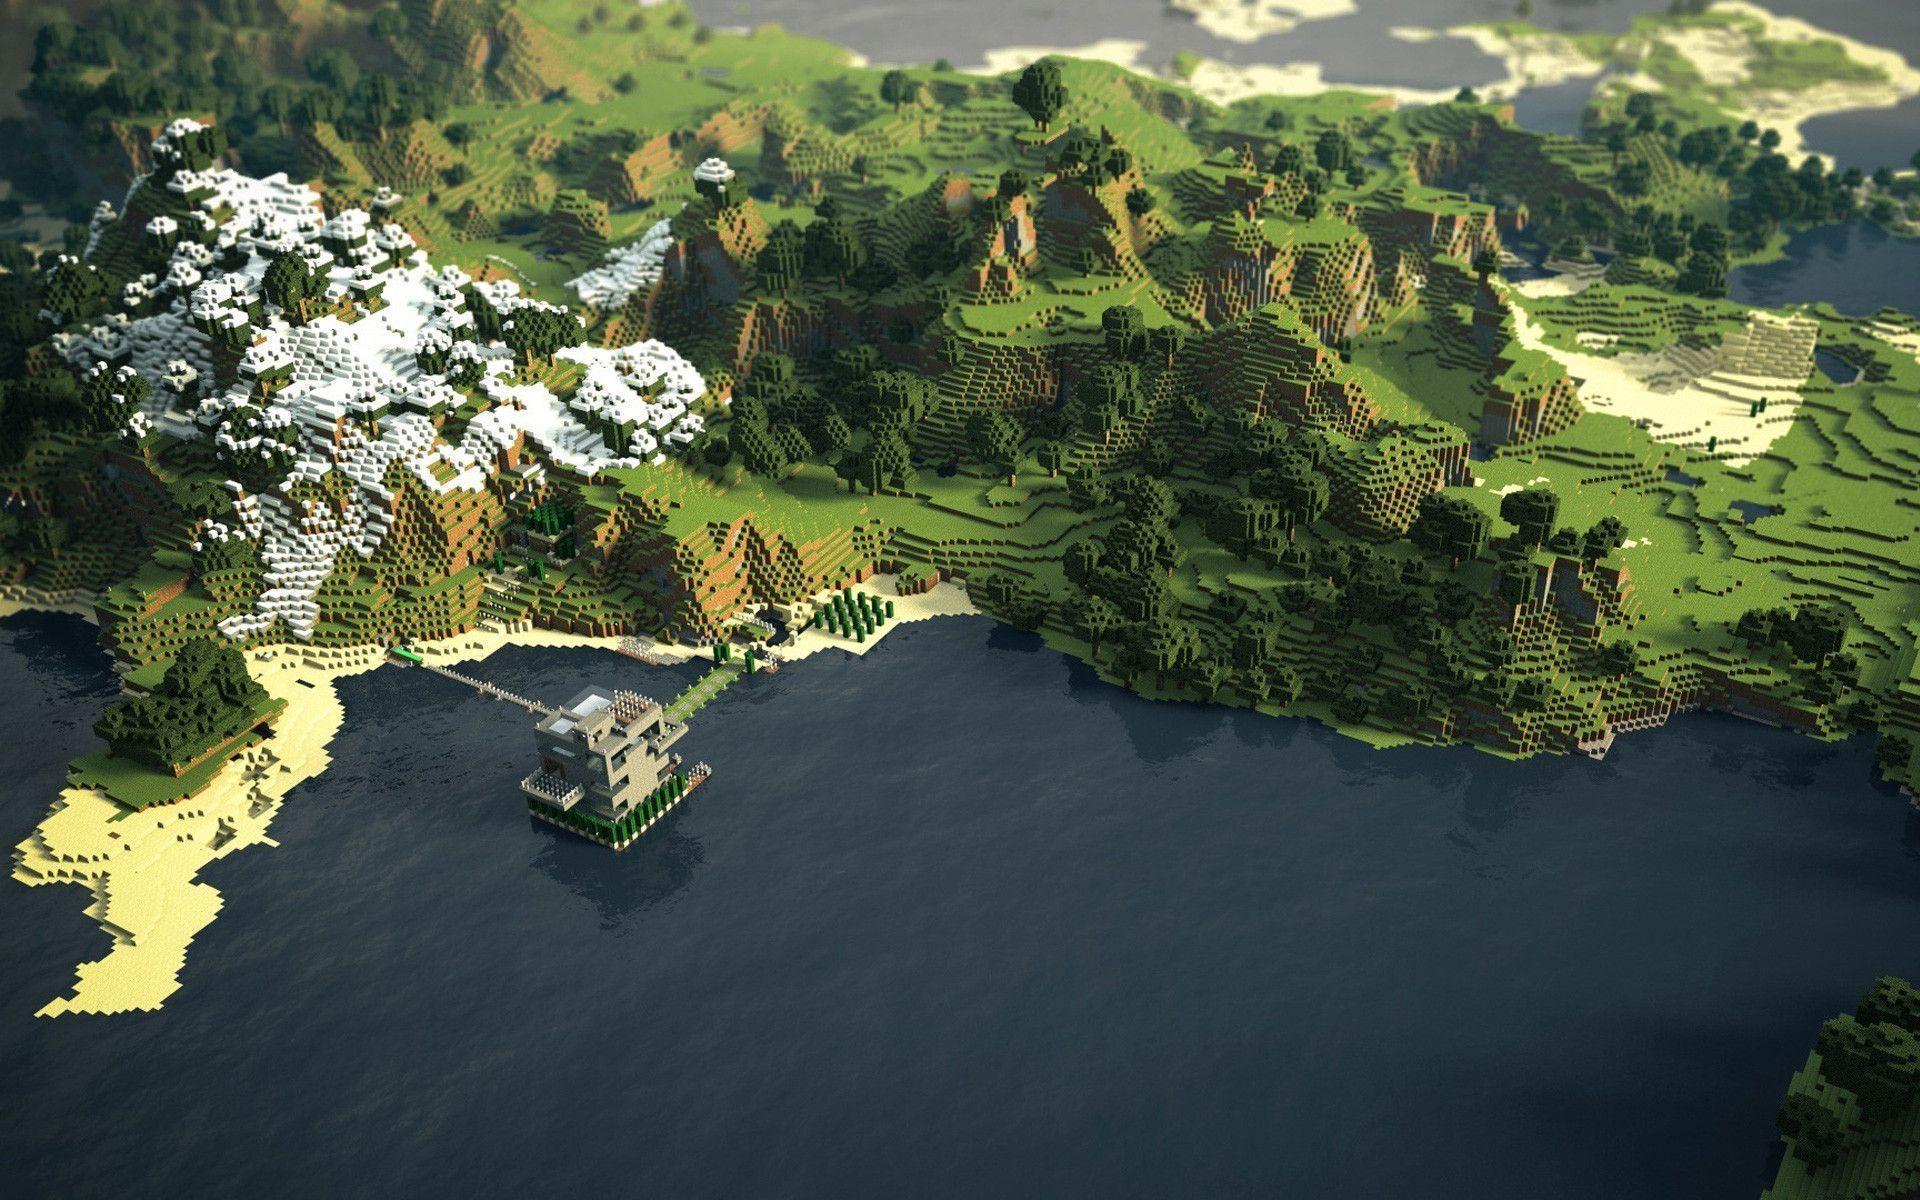 Minecraft Diamond Wallpapers - Full HD wallpaper search